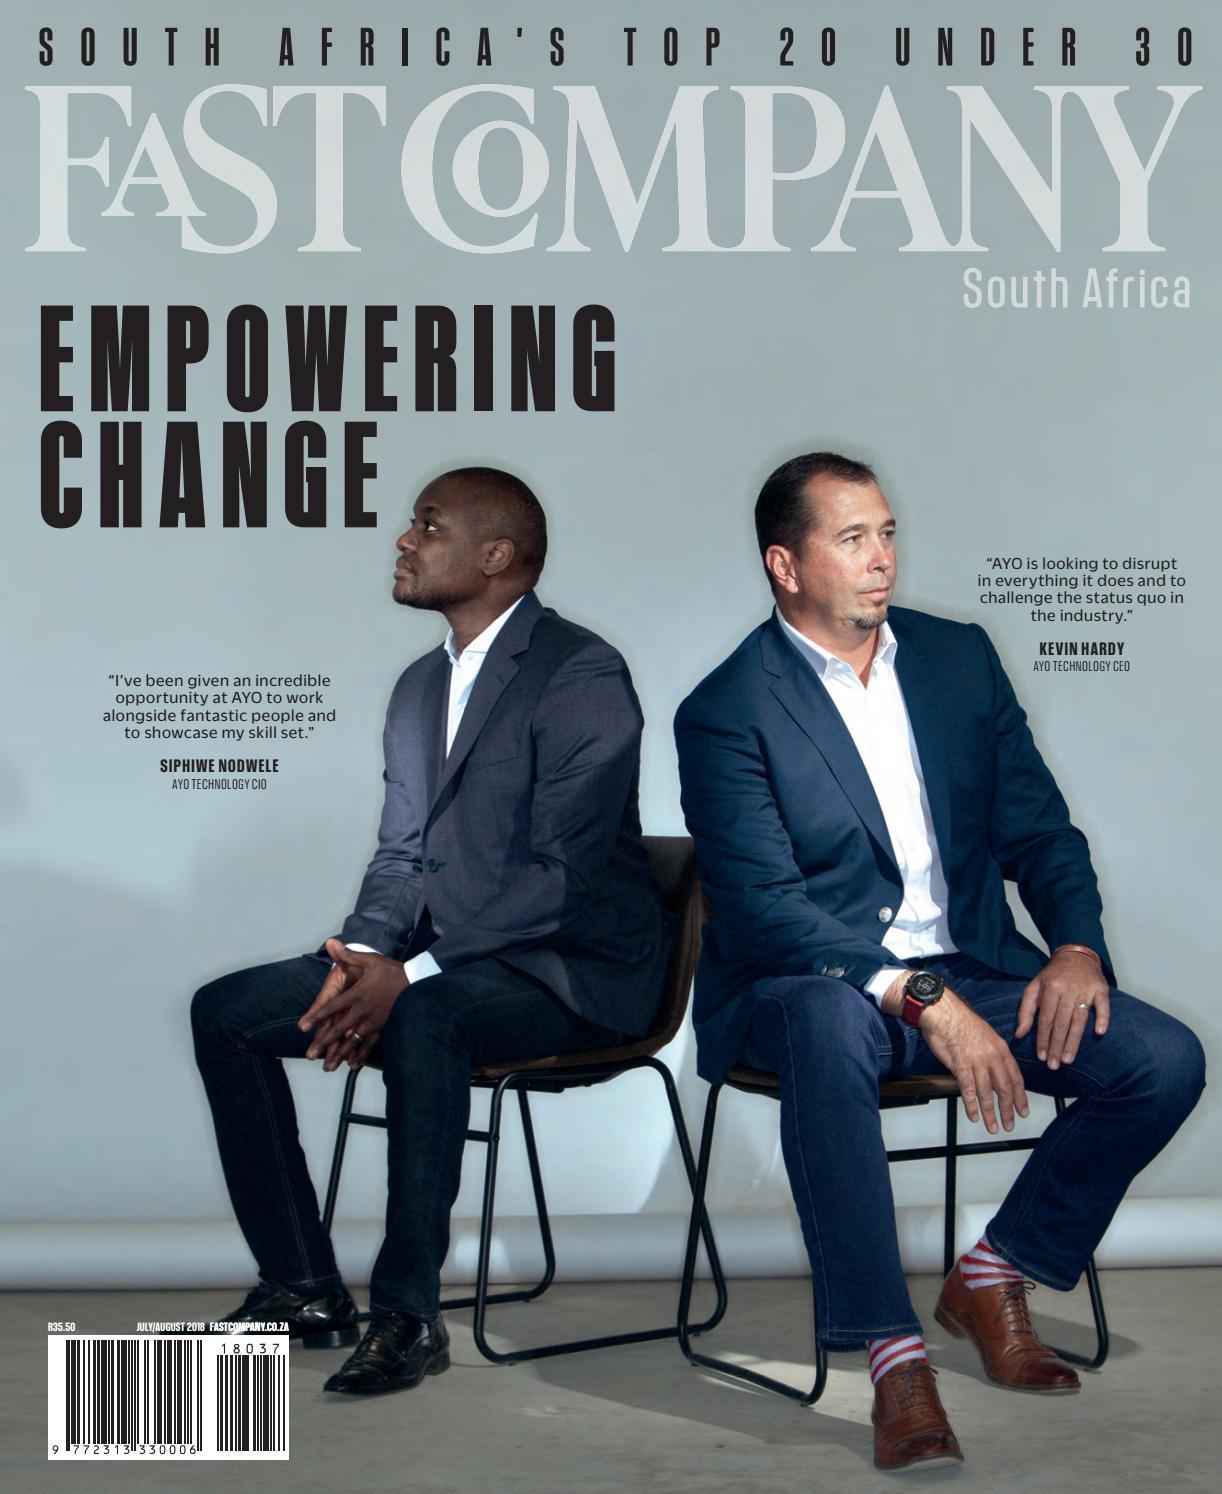 Fast Company SA July/August - Issue 37 by Fast Company SA - issuu